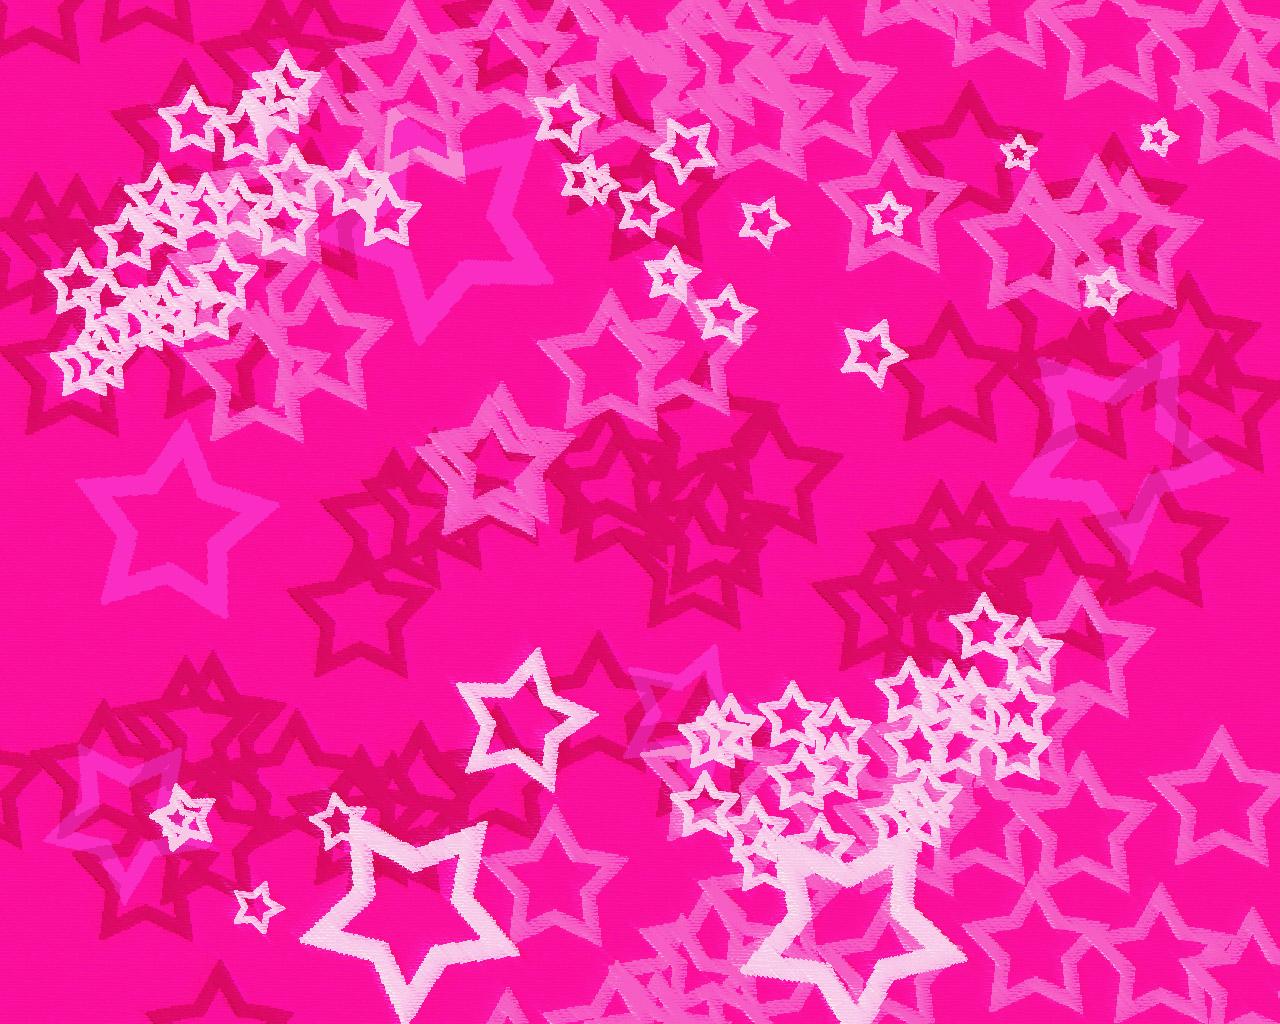 pink background desktop wallpaper   wwwwallpapers in hdcom 1280x1024